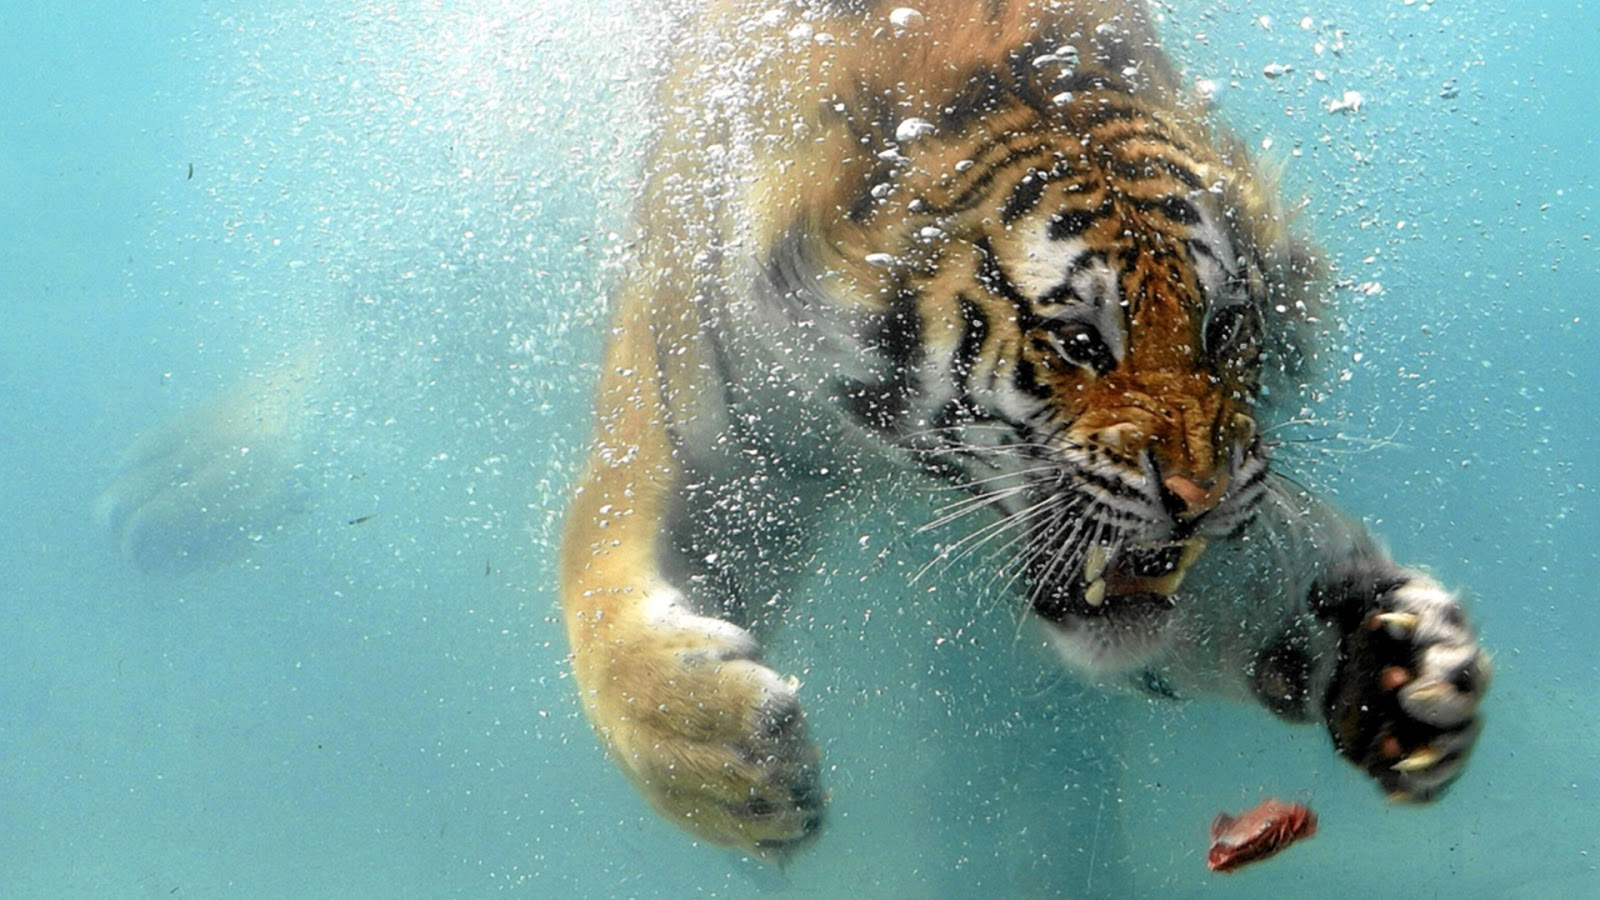 ashley wallpaper: white tiger,beautiful tiger,hd tiger images